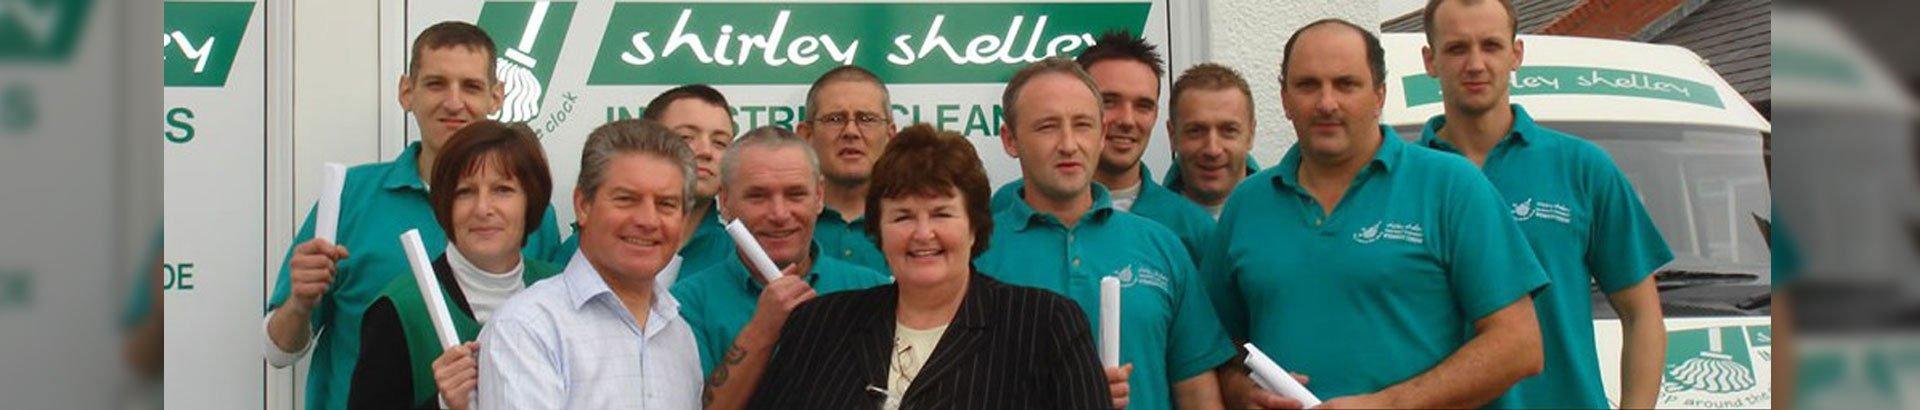 Shirley Shelley Staff